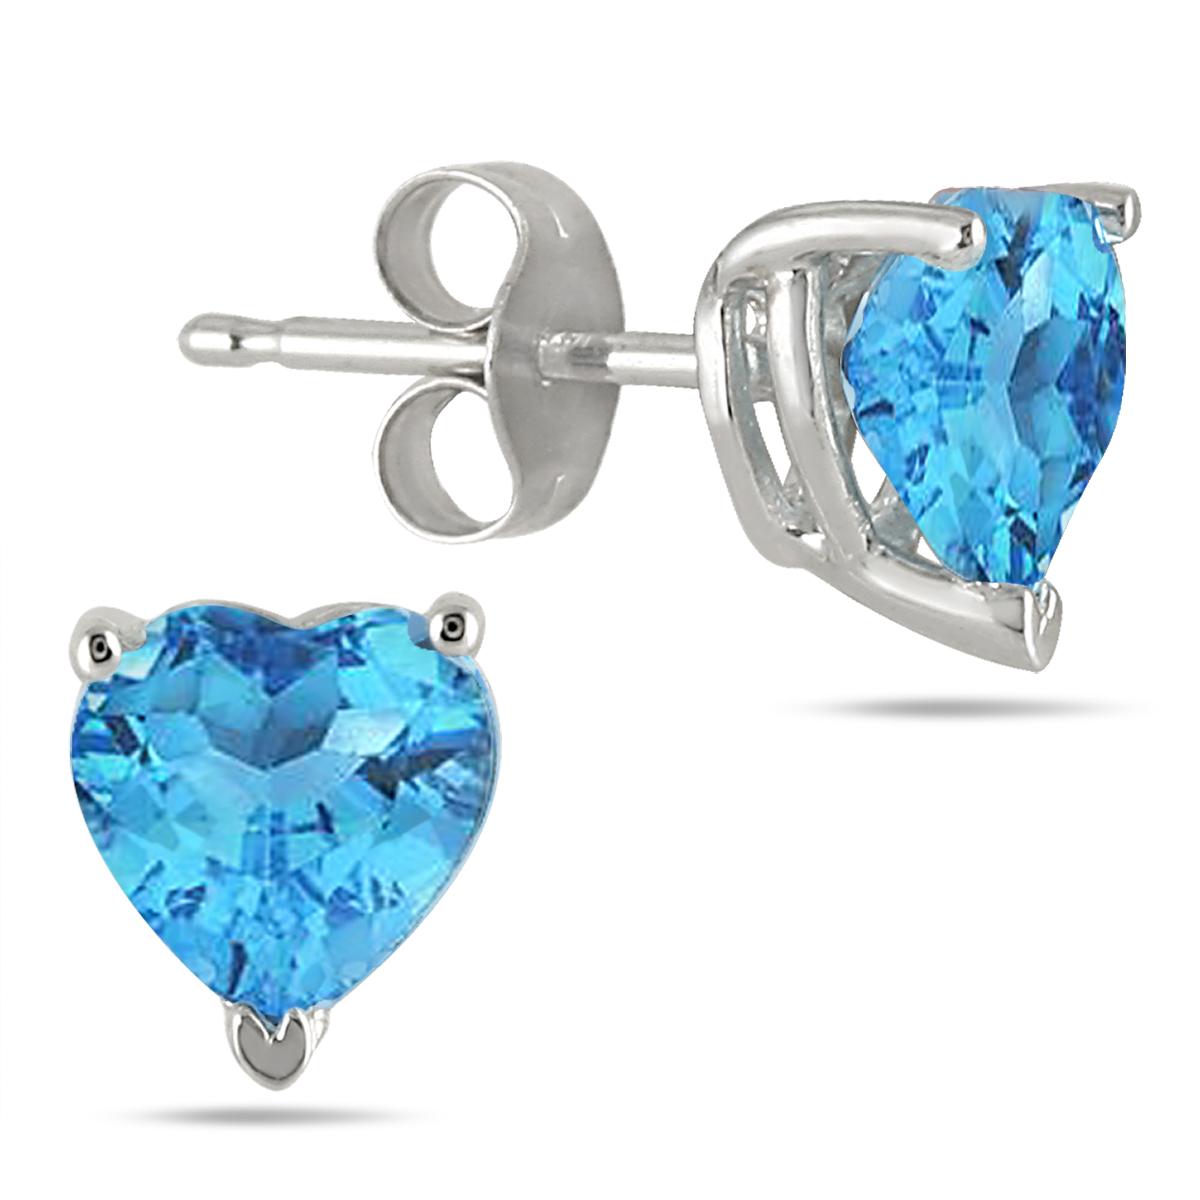 7MM All Natural Heart Blue Topaz Stud